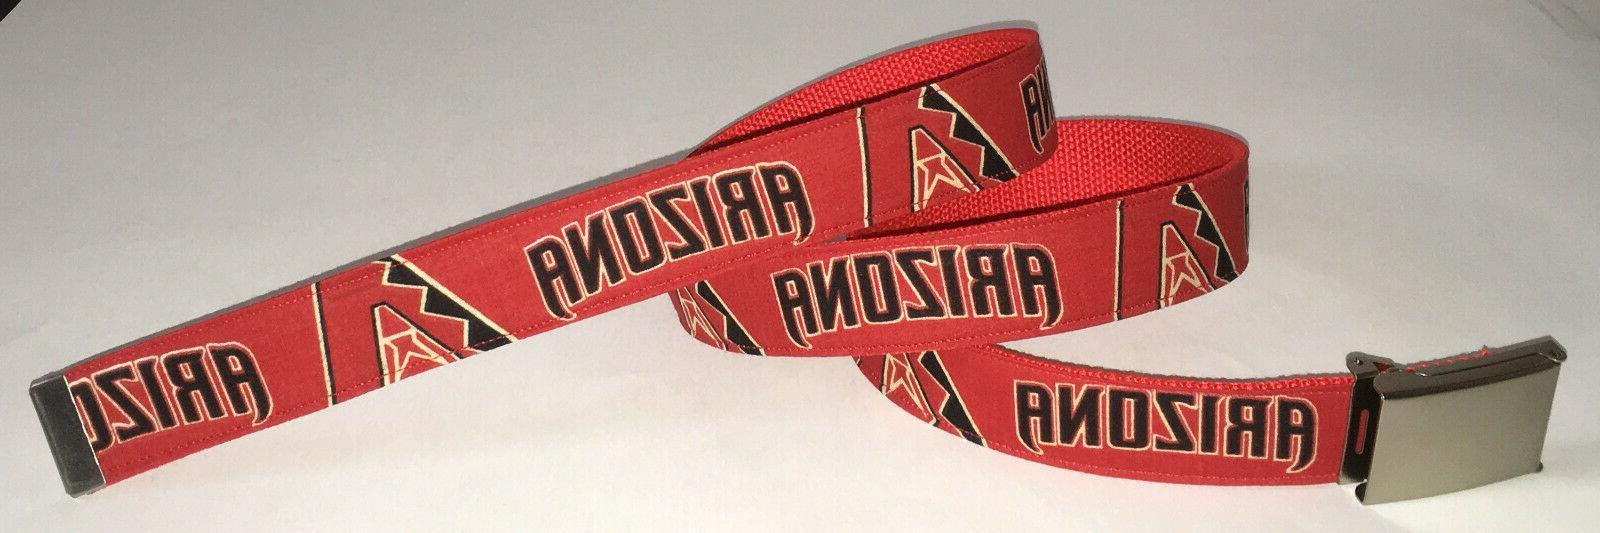 arizona diamondbacks belt and buckle baseball fan